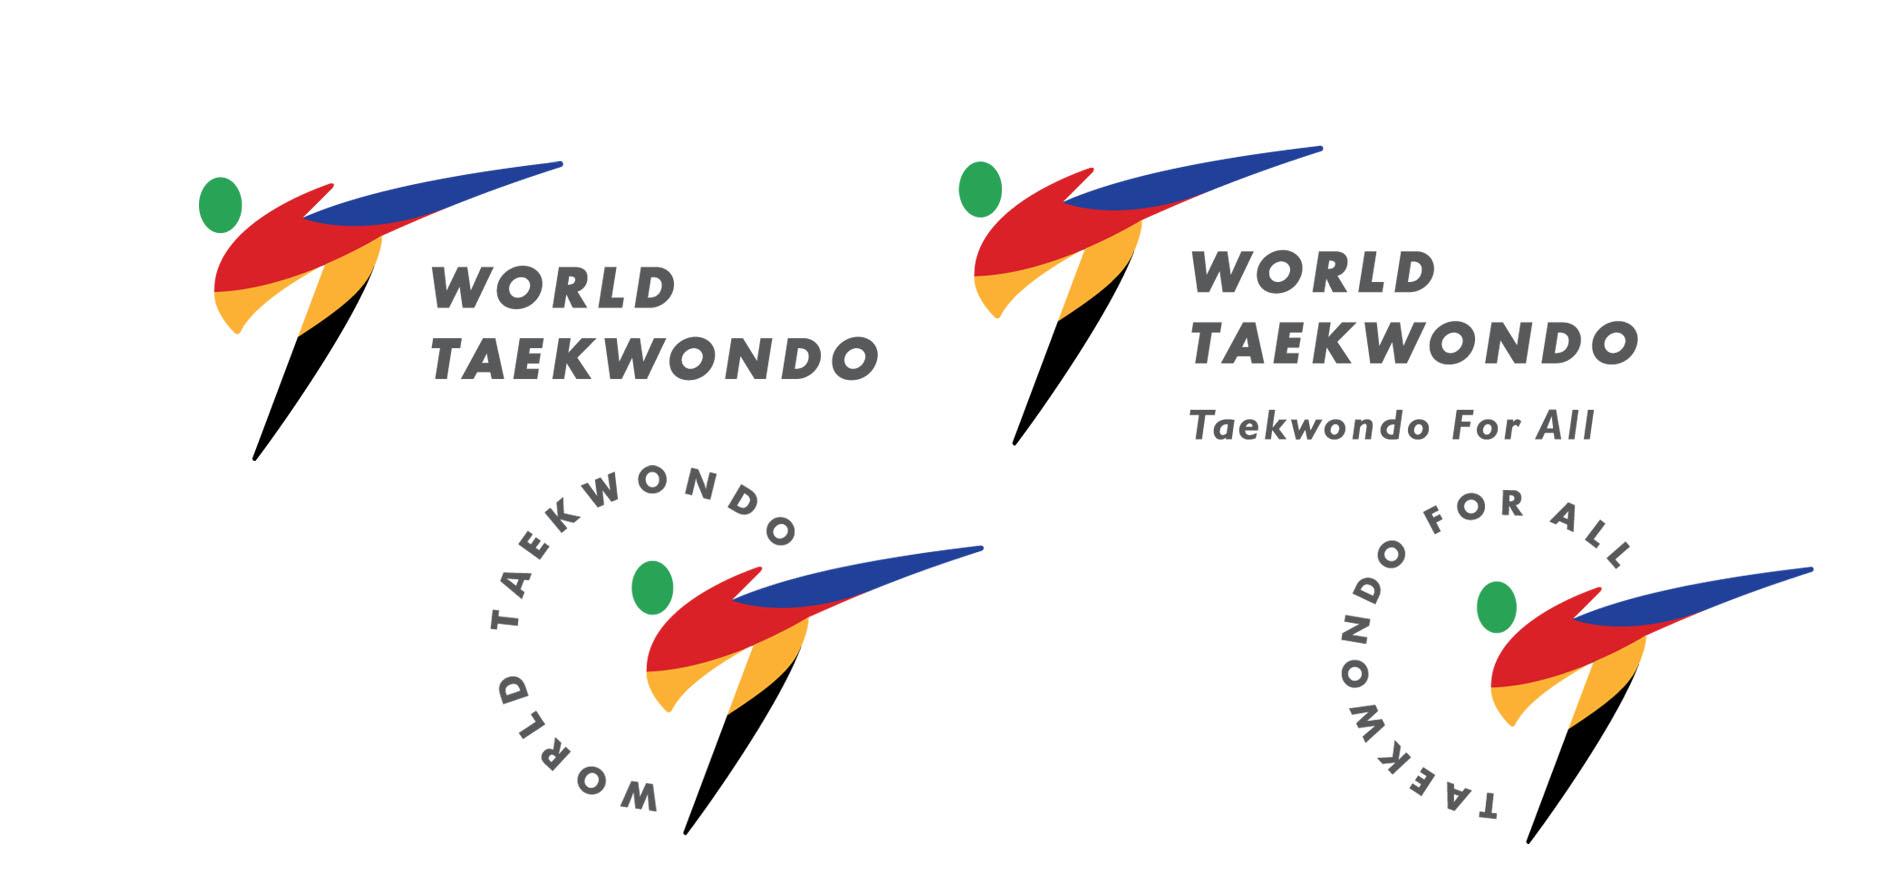 WorldTaekwondo